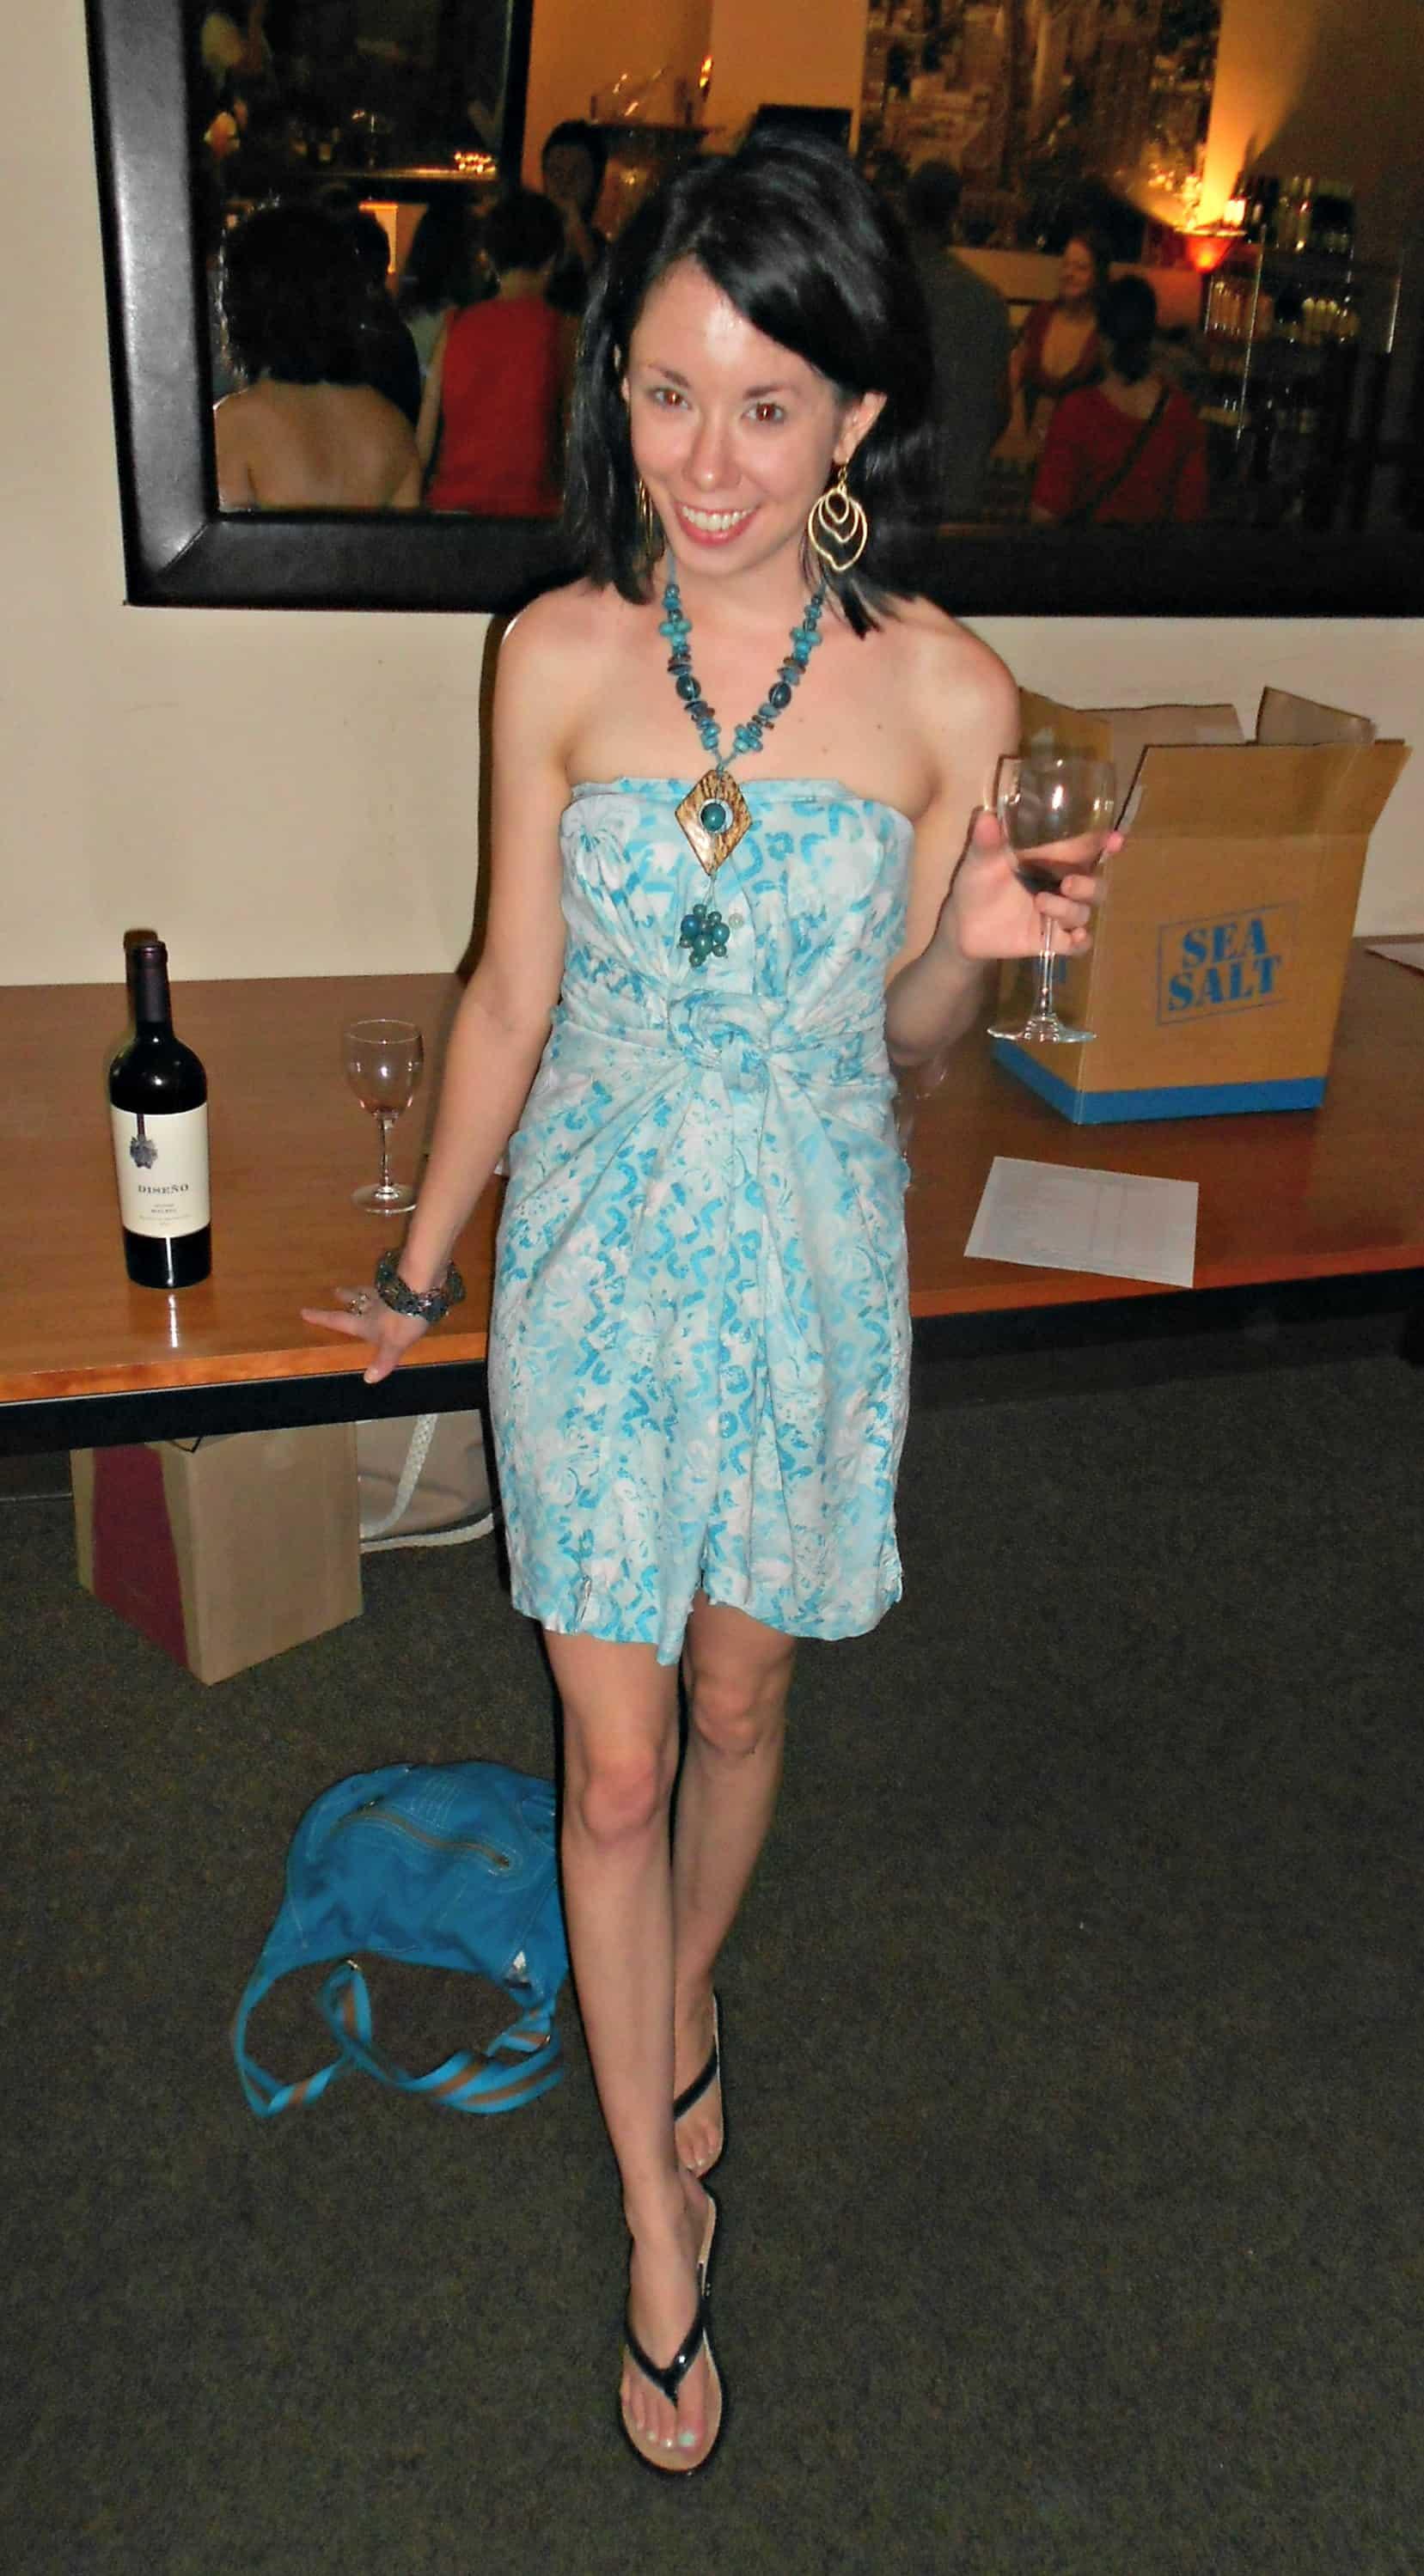 Day 352:  Blue Cove Dress 3